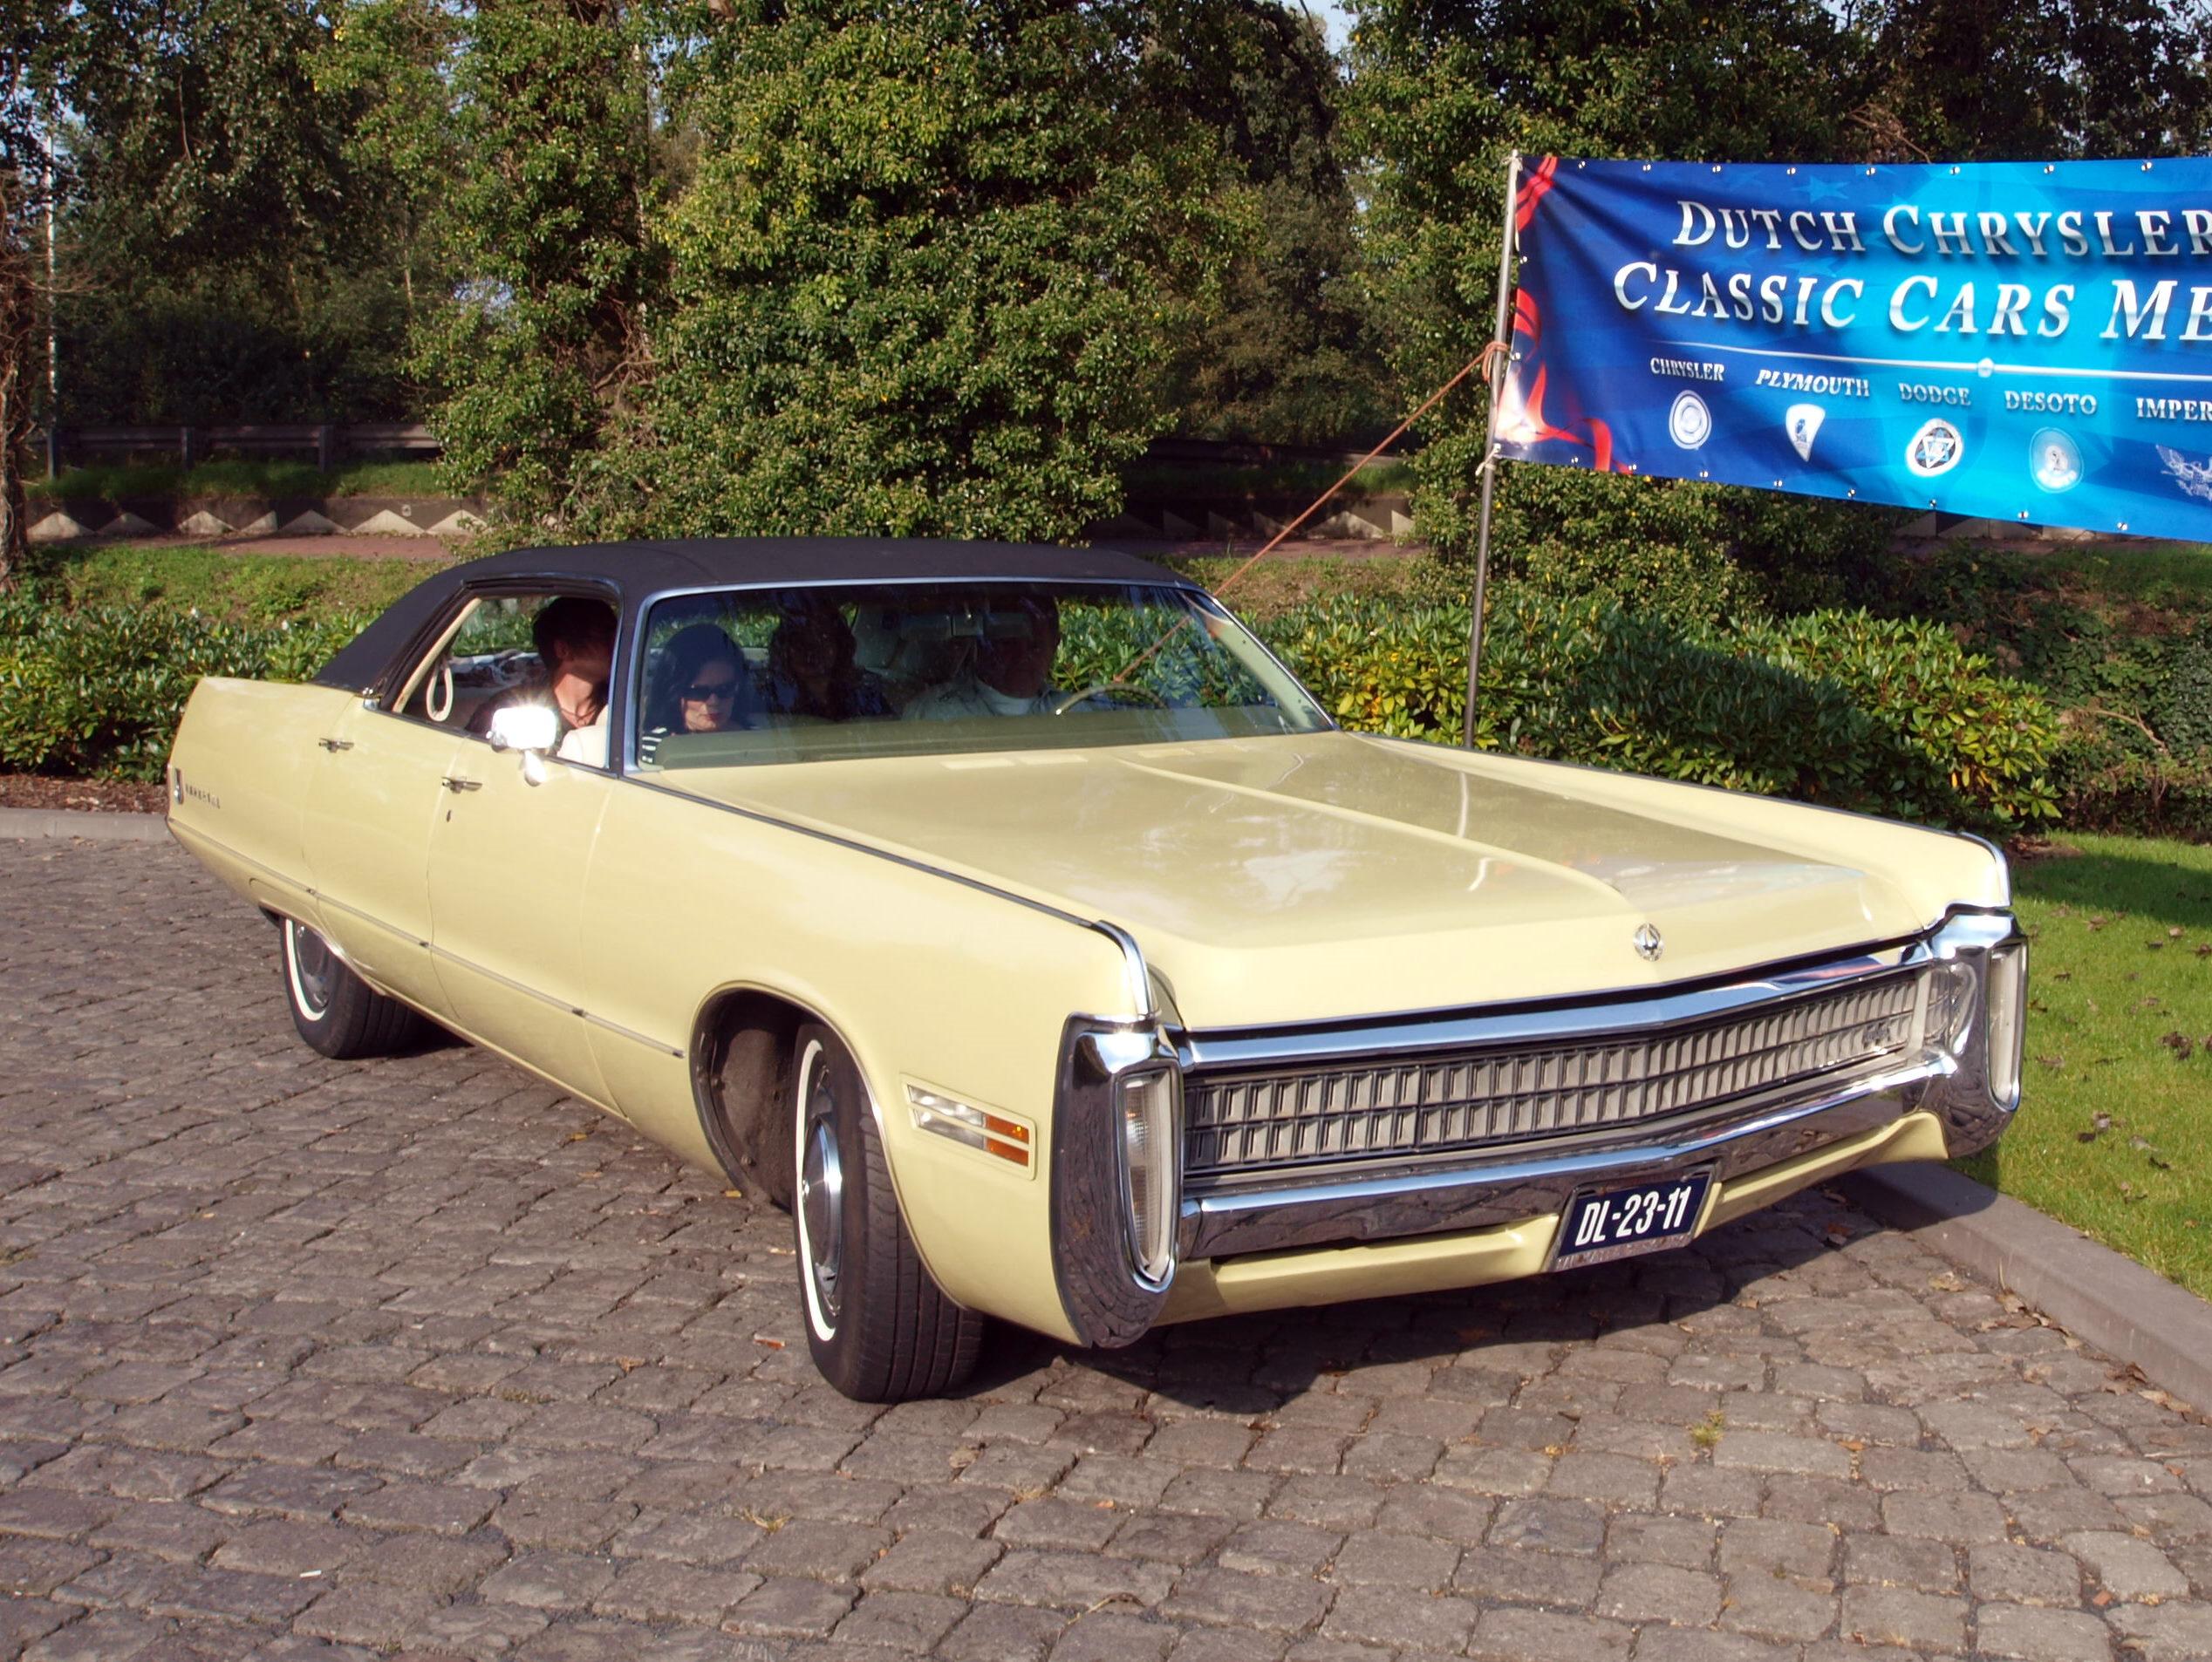 File:1972 Chrysler Imperial Le Baron photo-5.JPG - Wikimedia Commons